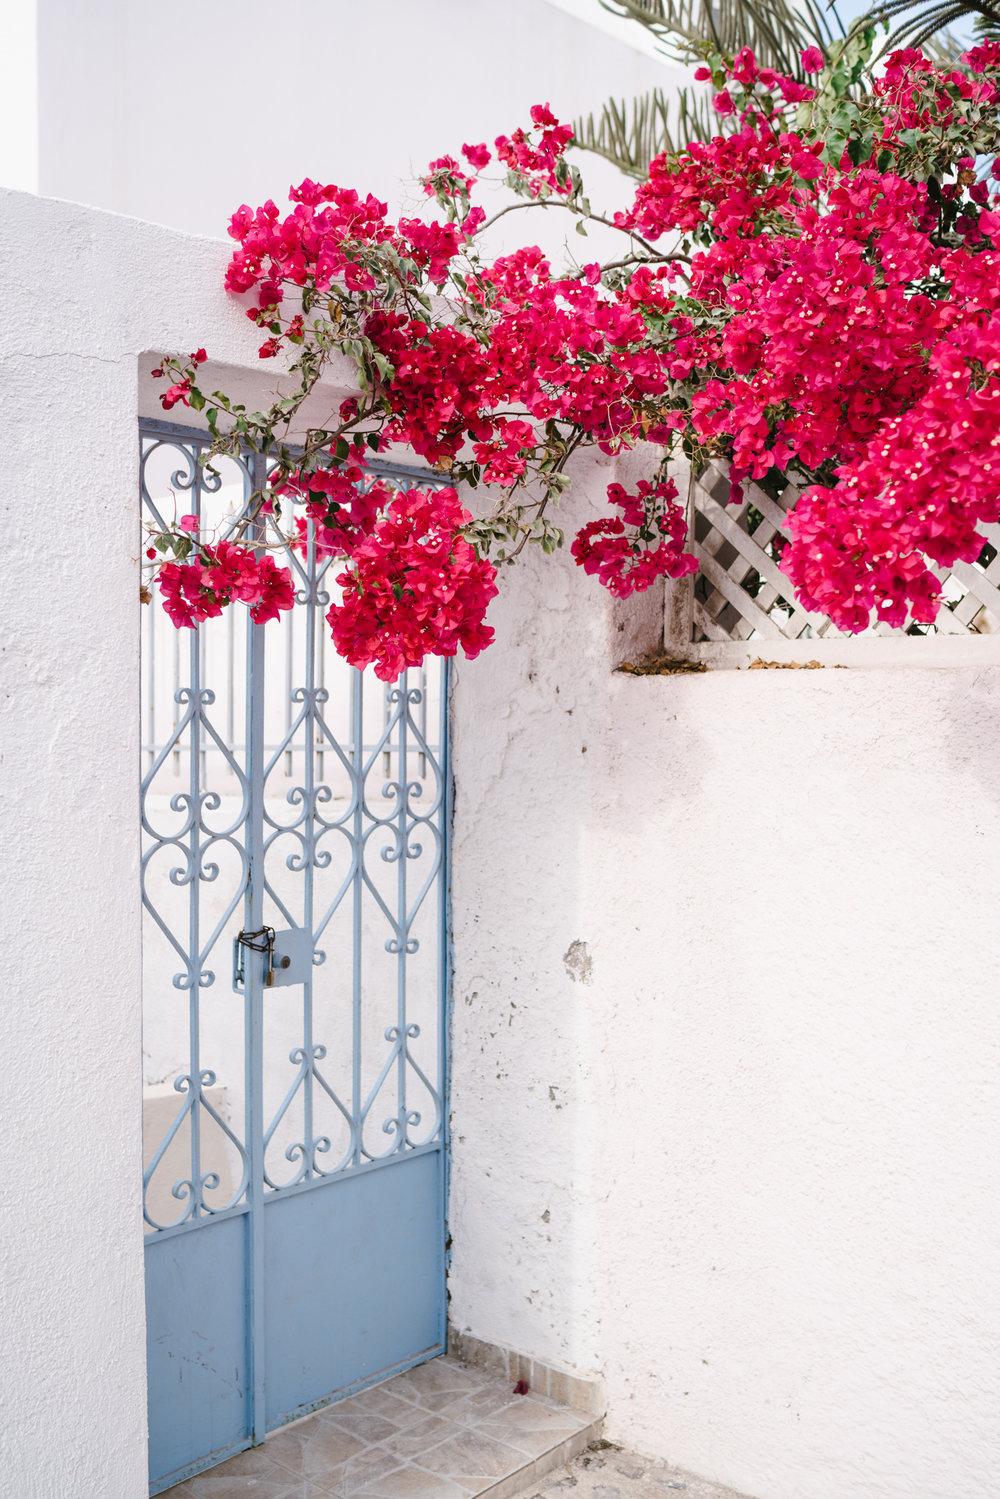 Beautiful bougainvillea around every corner in Greece